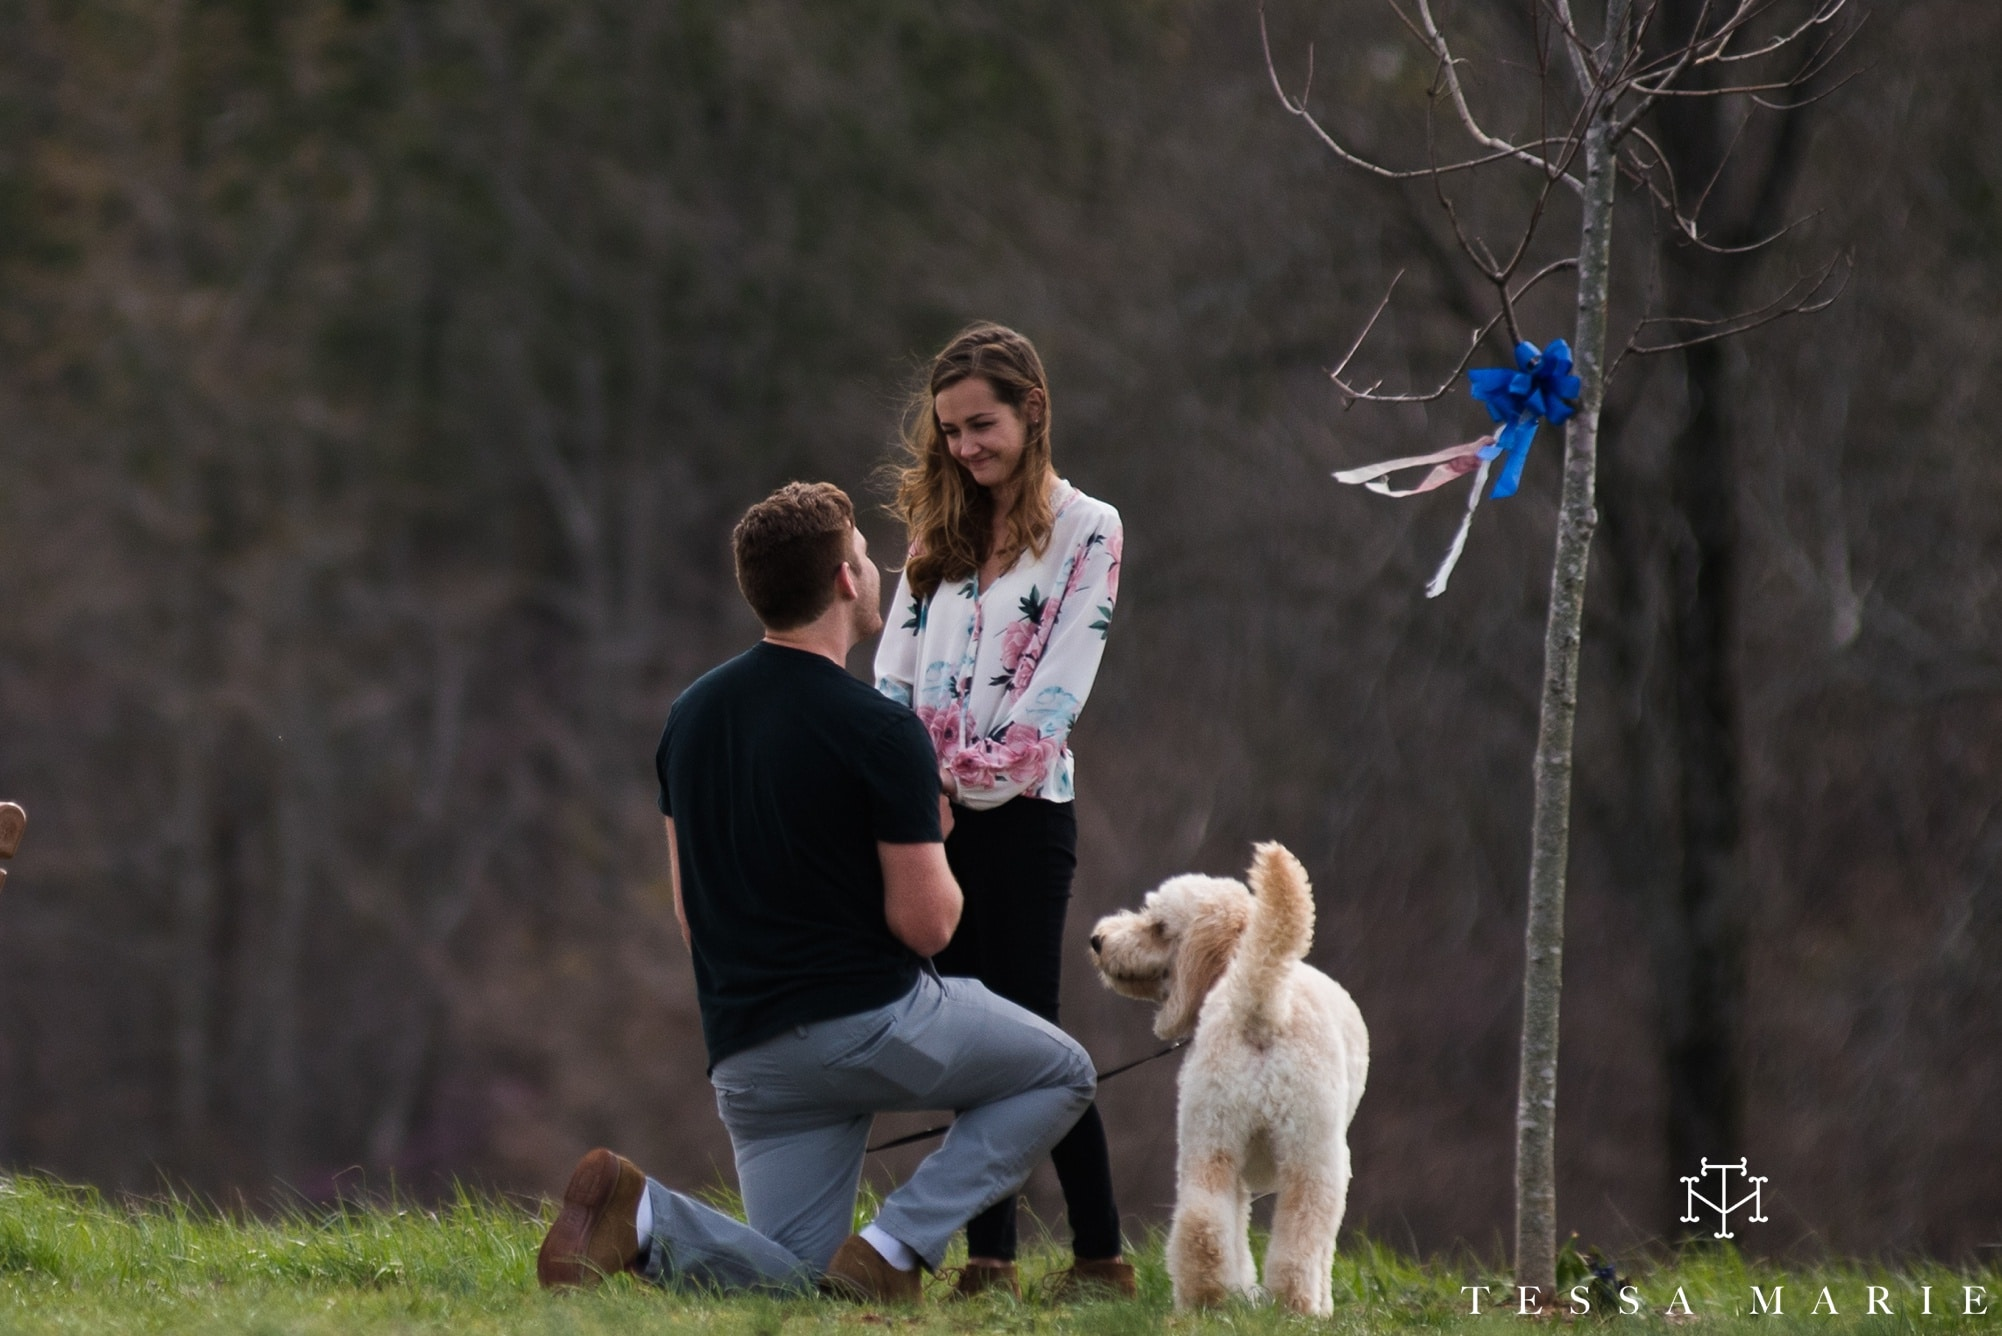 tessa_marie_studios_tessa_marie_weddings_proposal_atlanta_engagement_pictures_0048